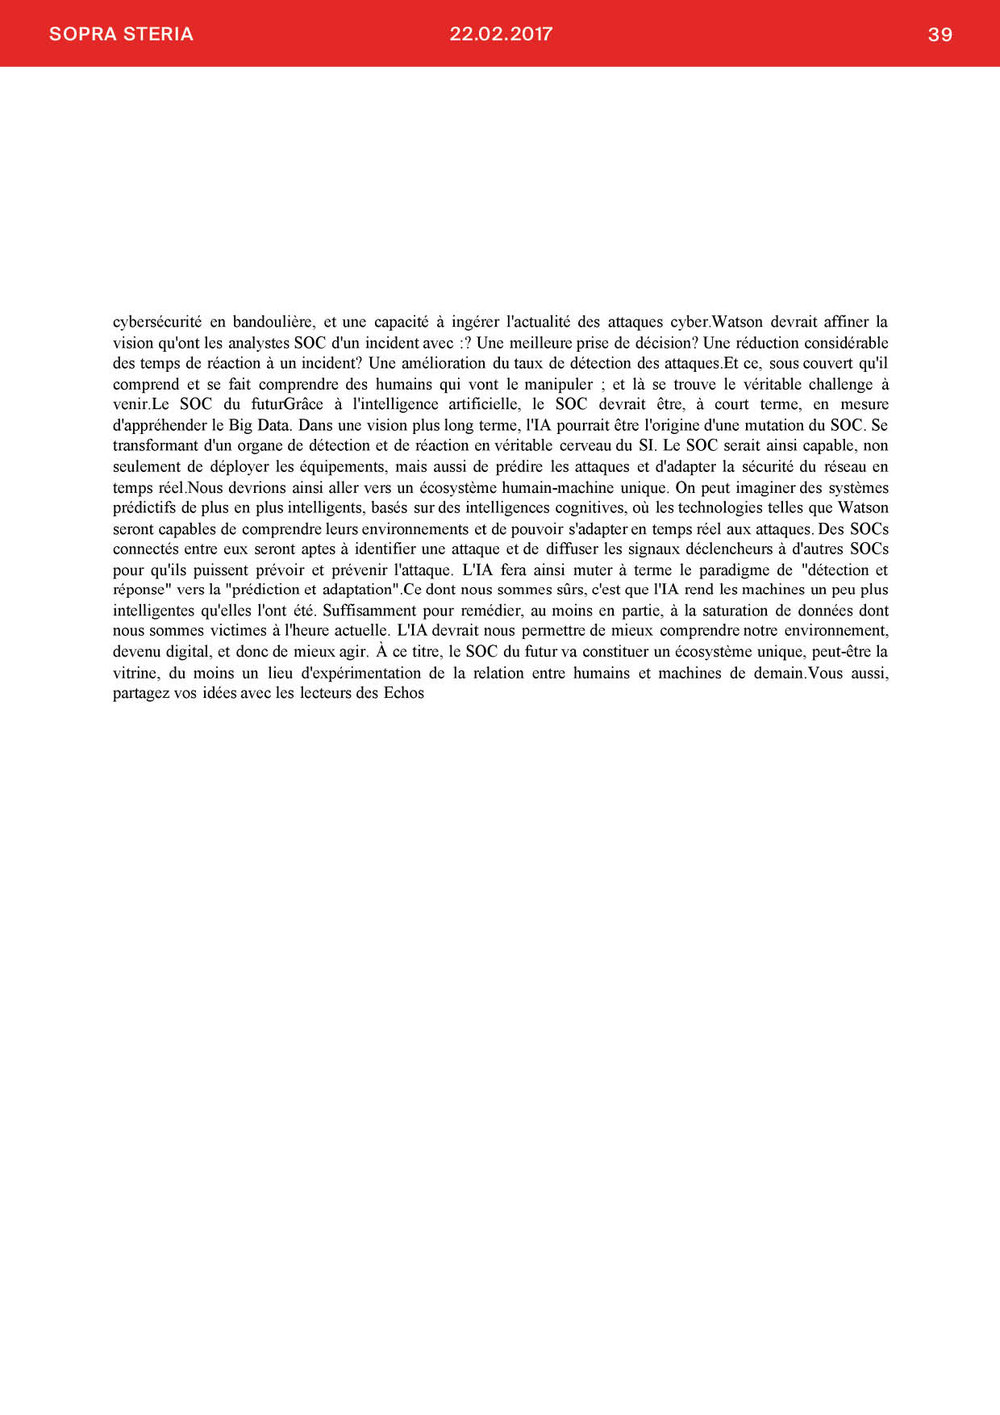 BOOKMEDIA_FEV39.jpg